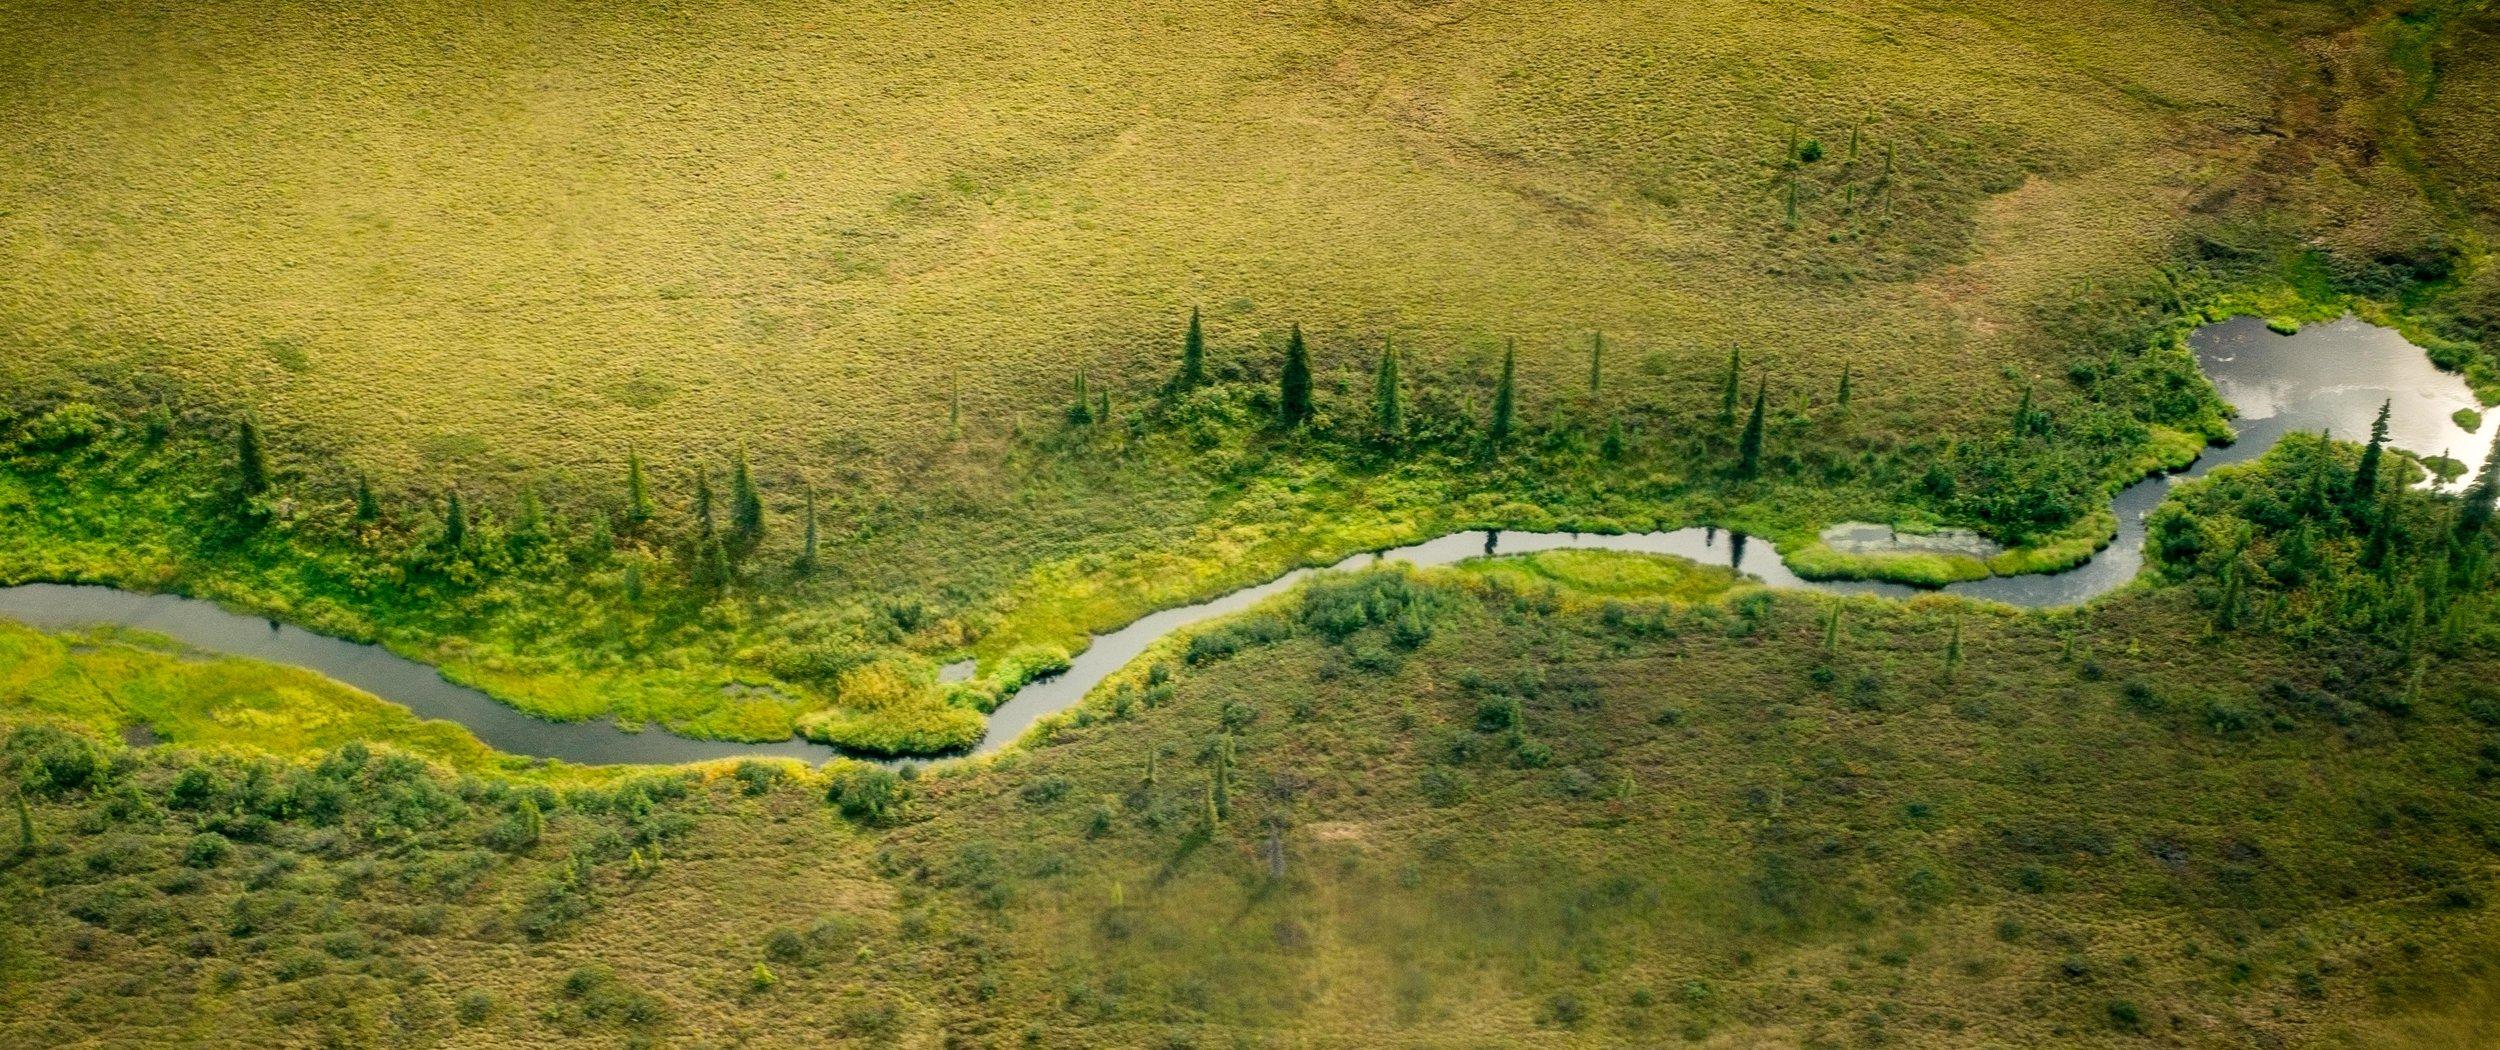 Kobuk Valley National Park - 005.jpg